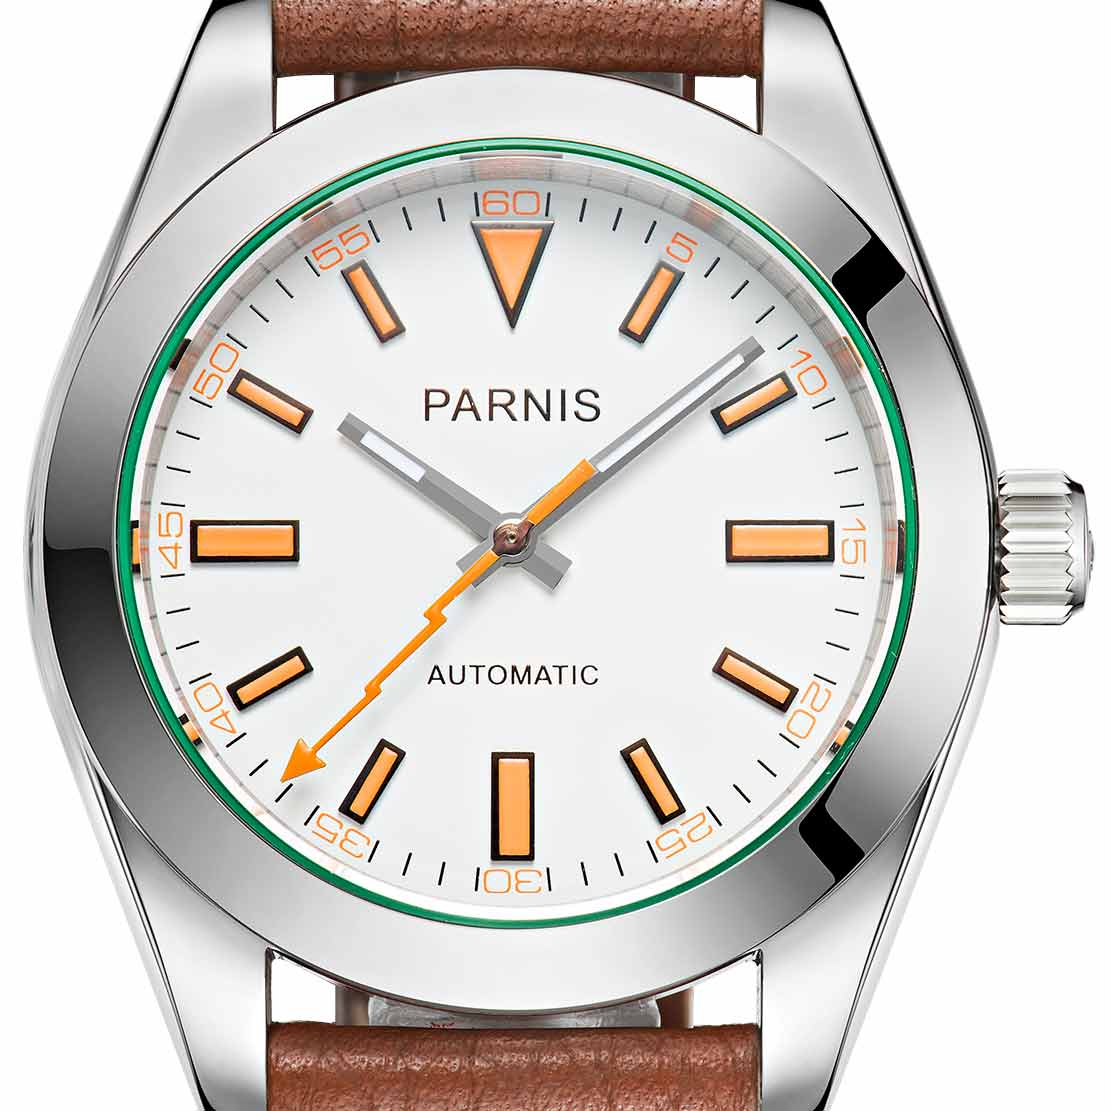 【NEW】PARNIS パーニス クォーツ 腕時計 メンズ [PA2107-S3AL-WHBR] 並行輸入品 メーカー保証【新生活応援】 メンズウォッチ 海外 ブランド 腕時計 自動巻き 機械式